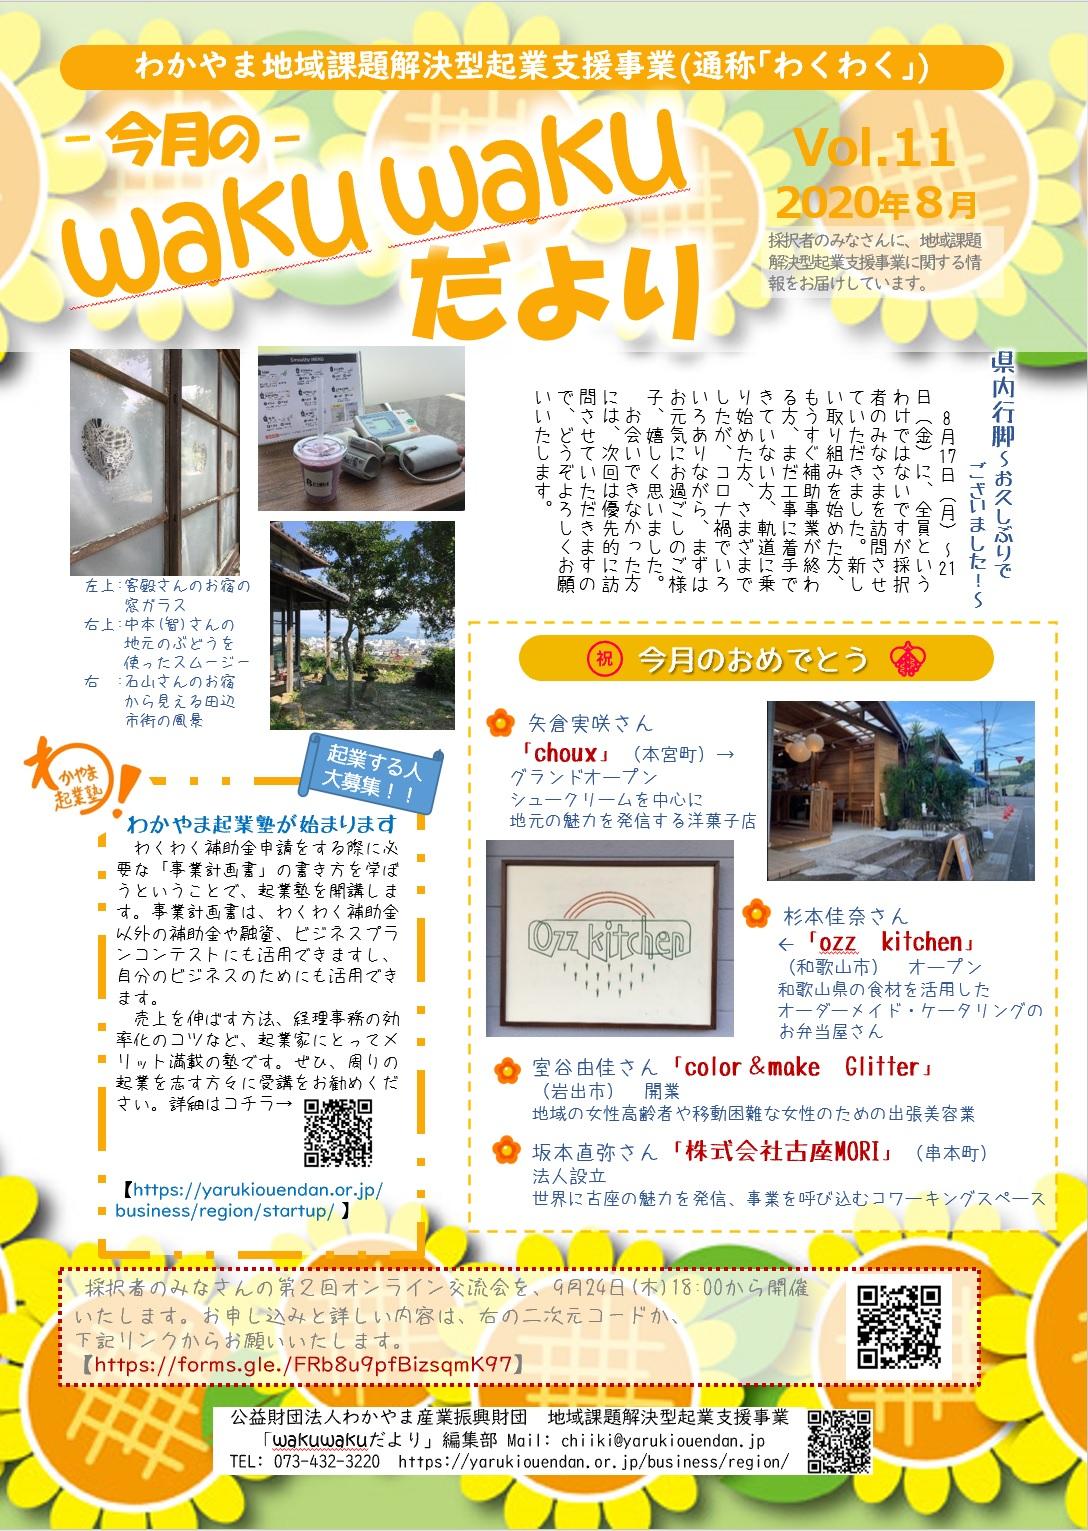 wakuwakuだより Vol.11